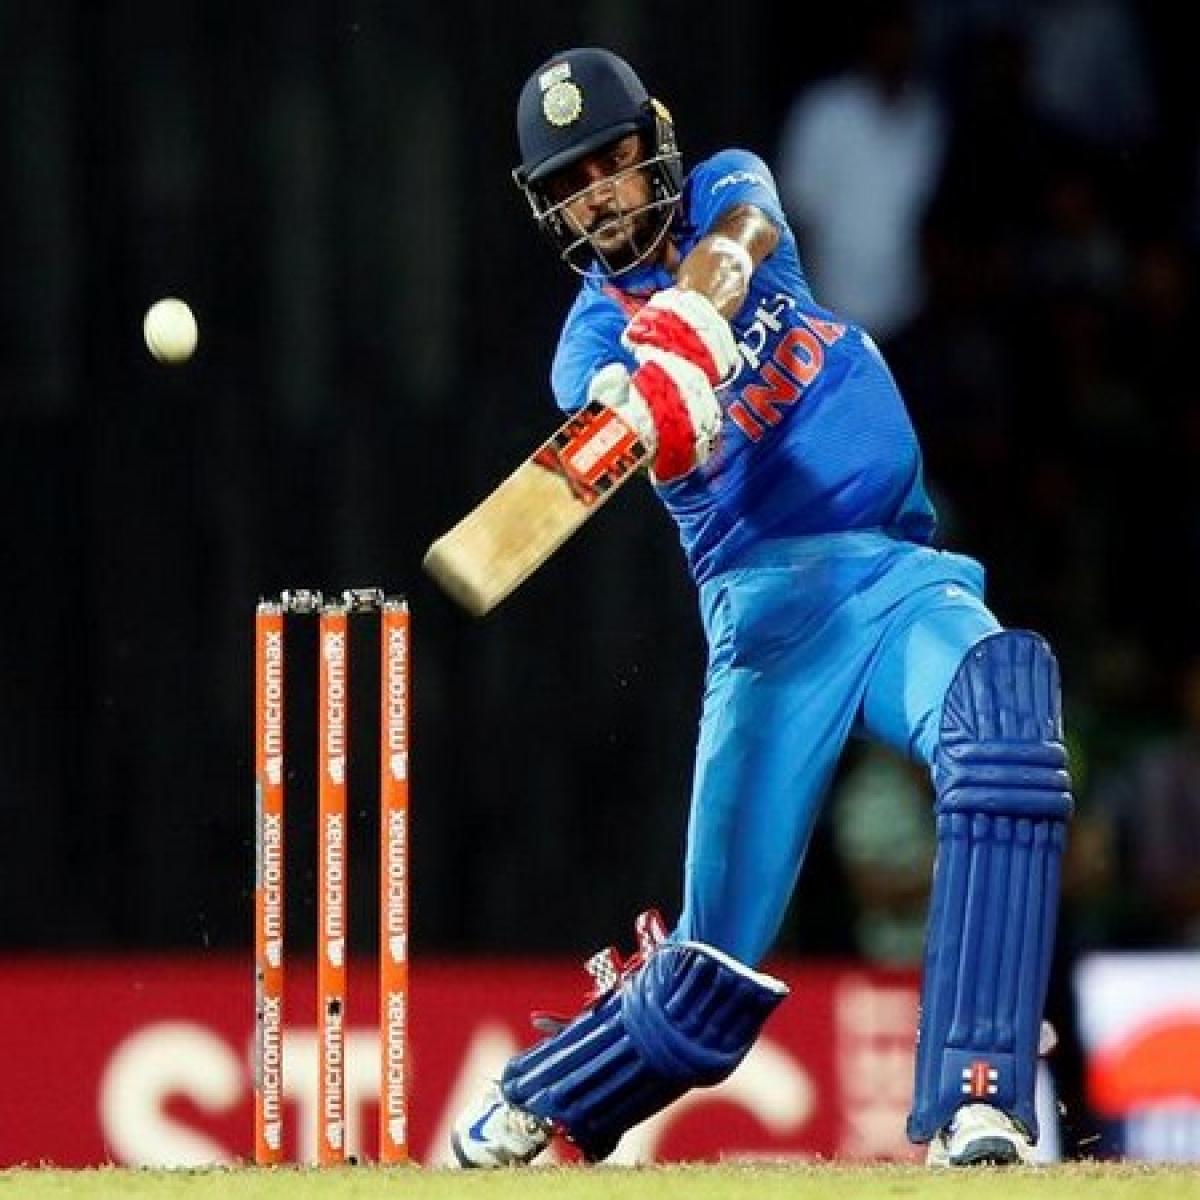 Manish Pandey, Krunal Pandya shine, India A take unassailable 3-0 lead against Windies A